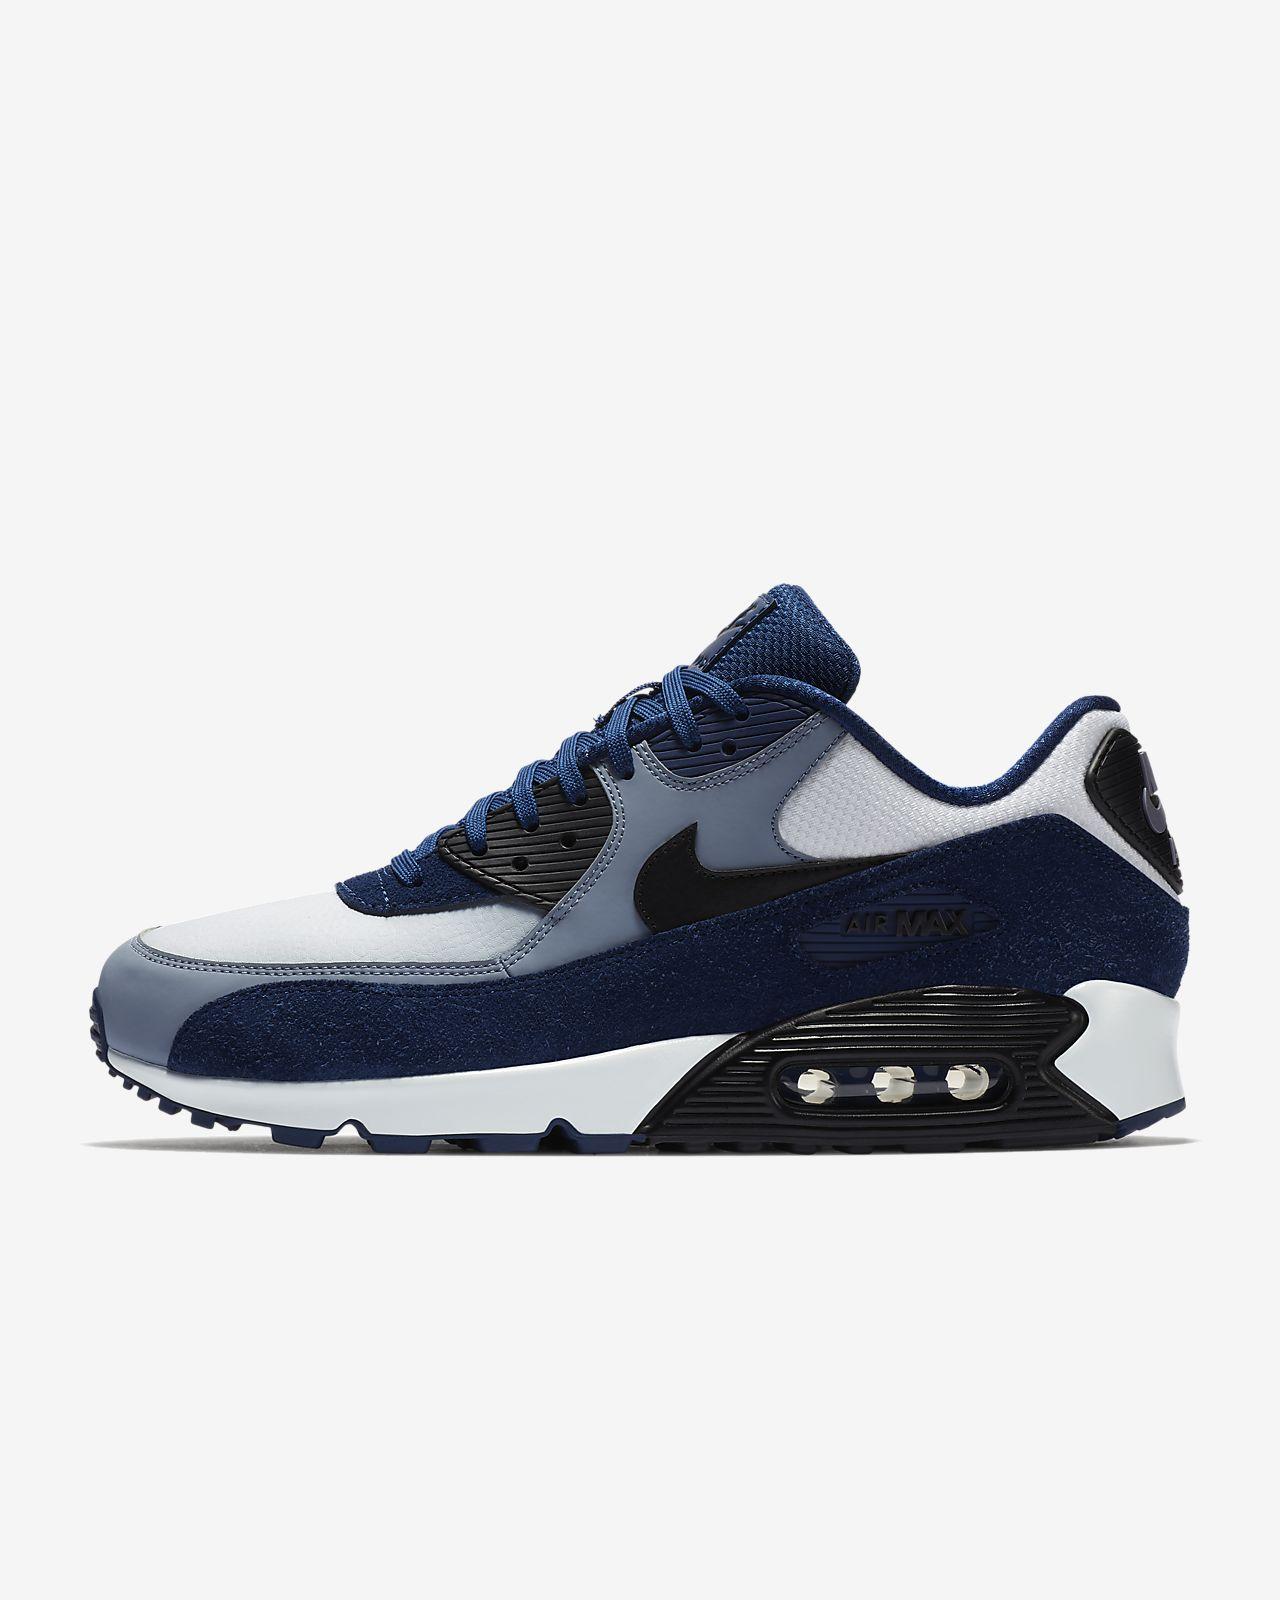 scarpa nike air max 90 leather blue voidashen slatepure